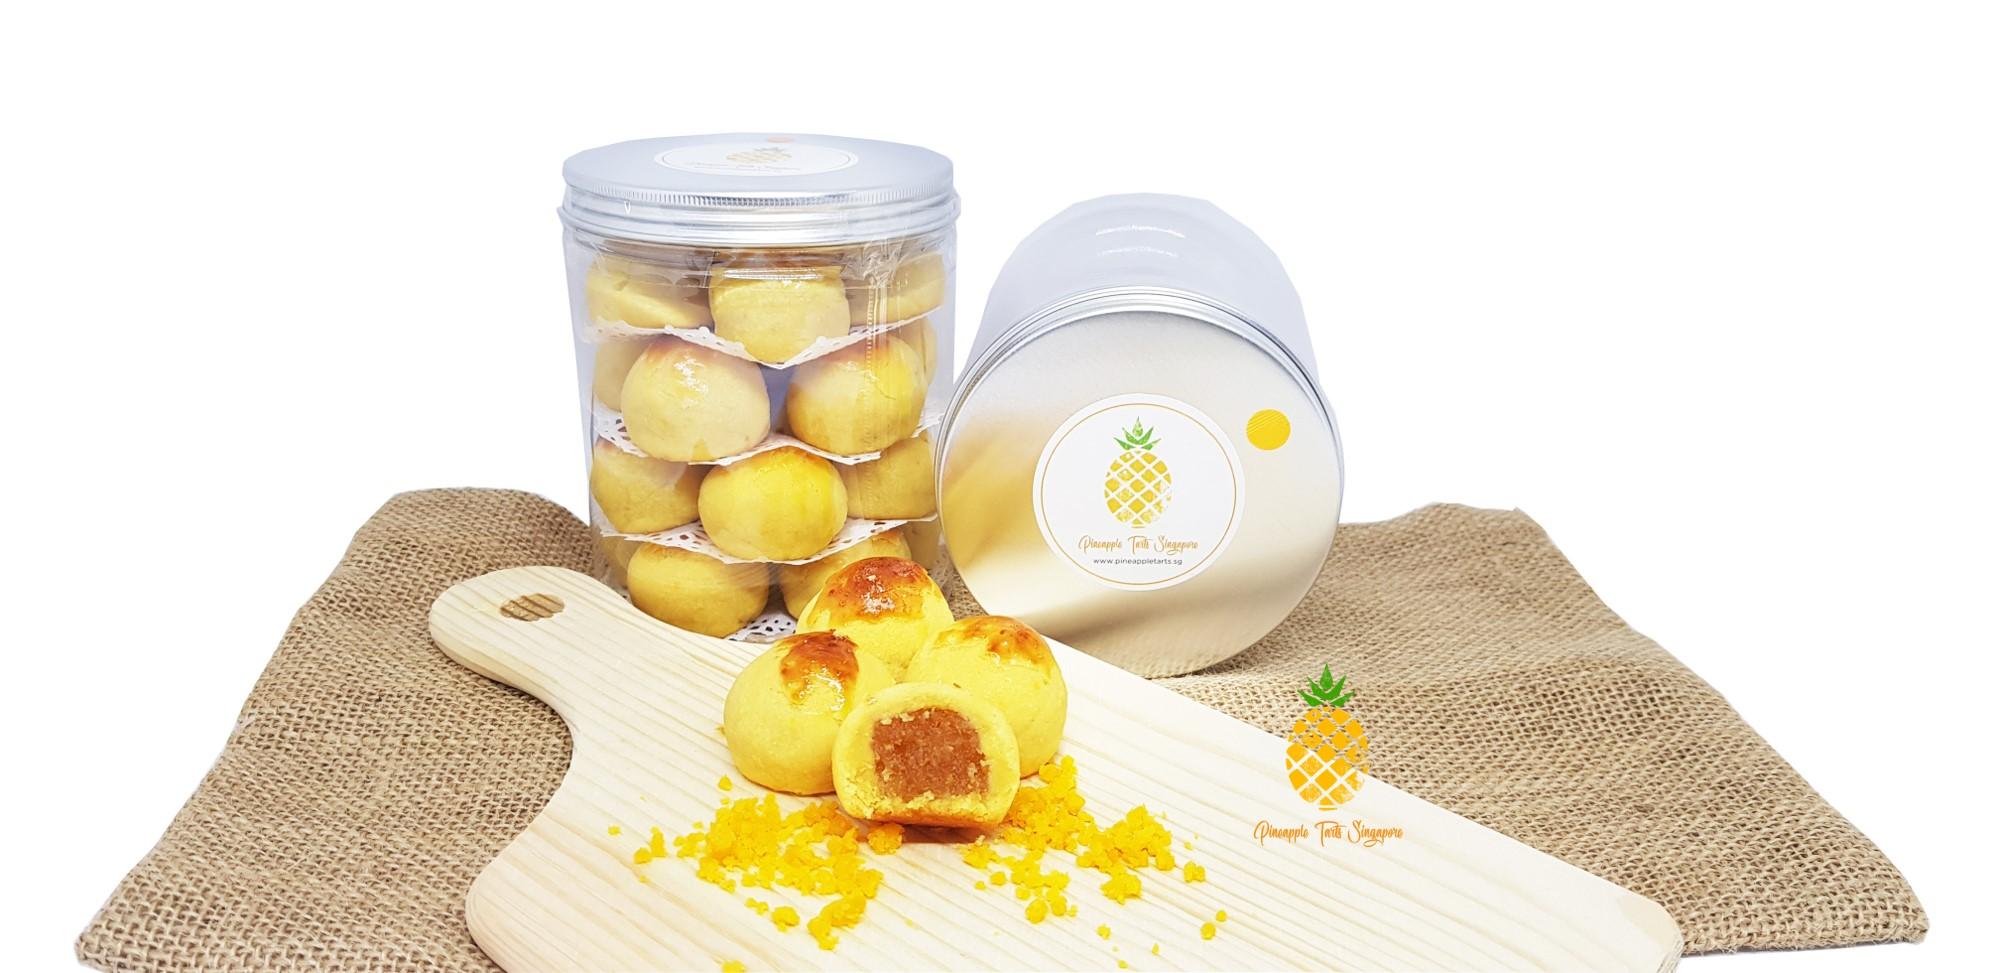 Salted Egg Pineapple Tarts - CNY Goodies